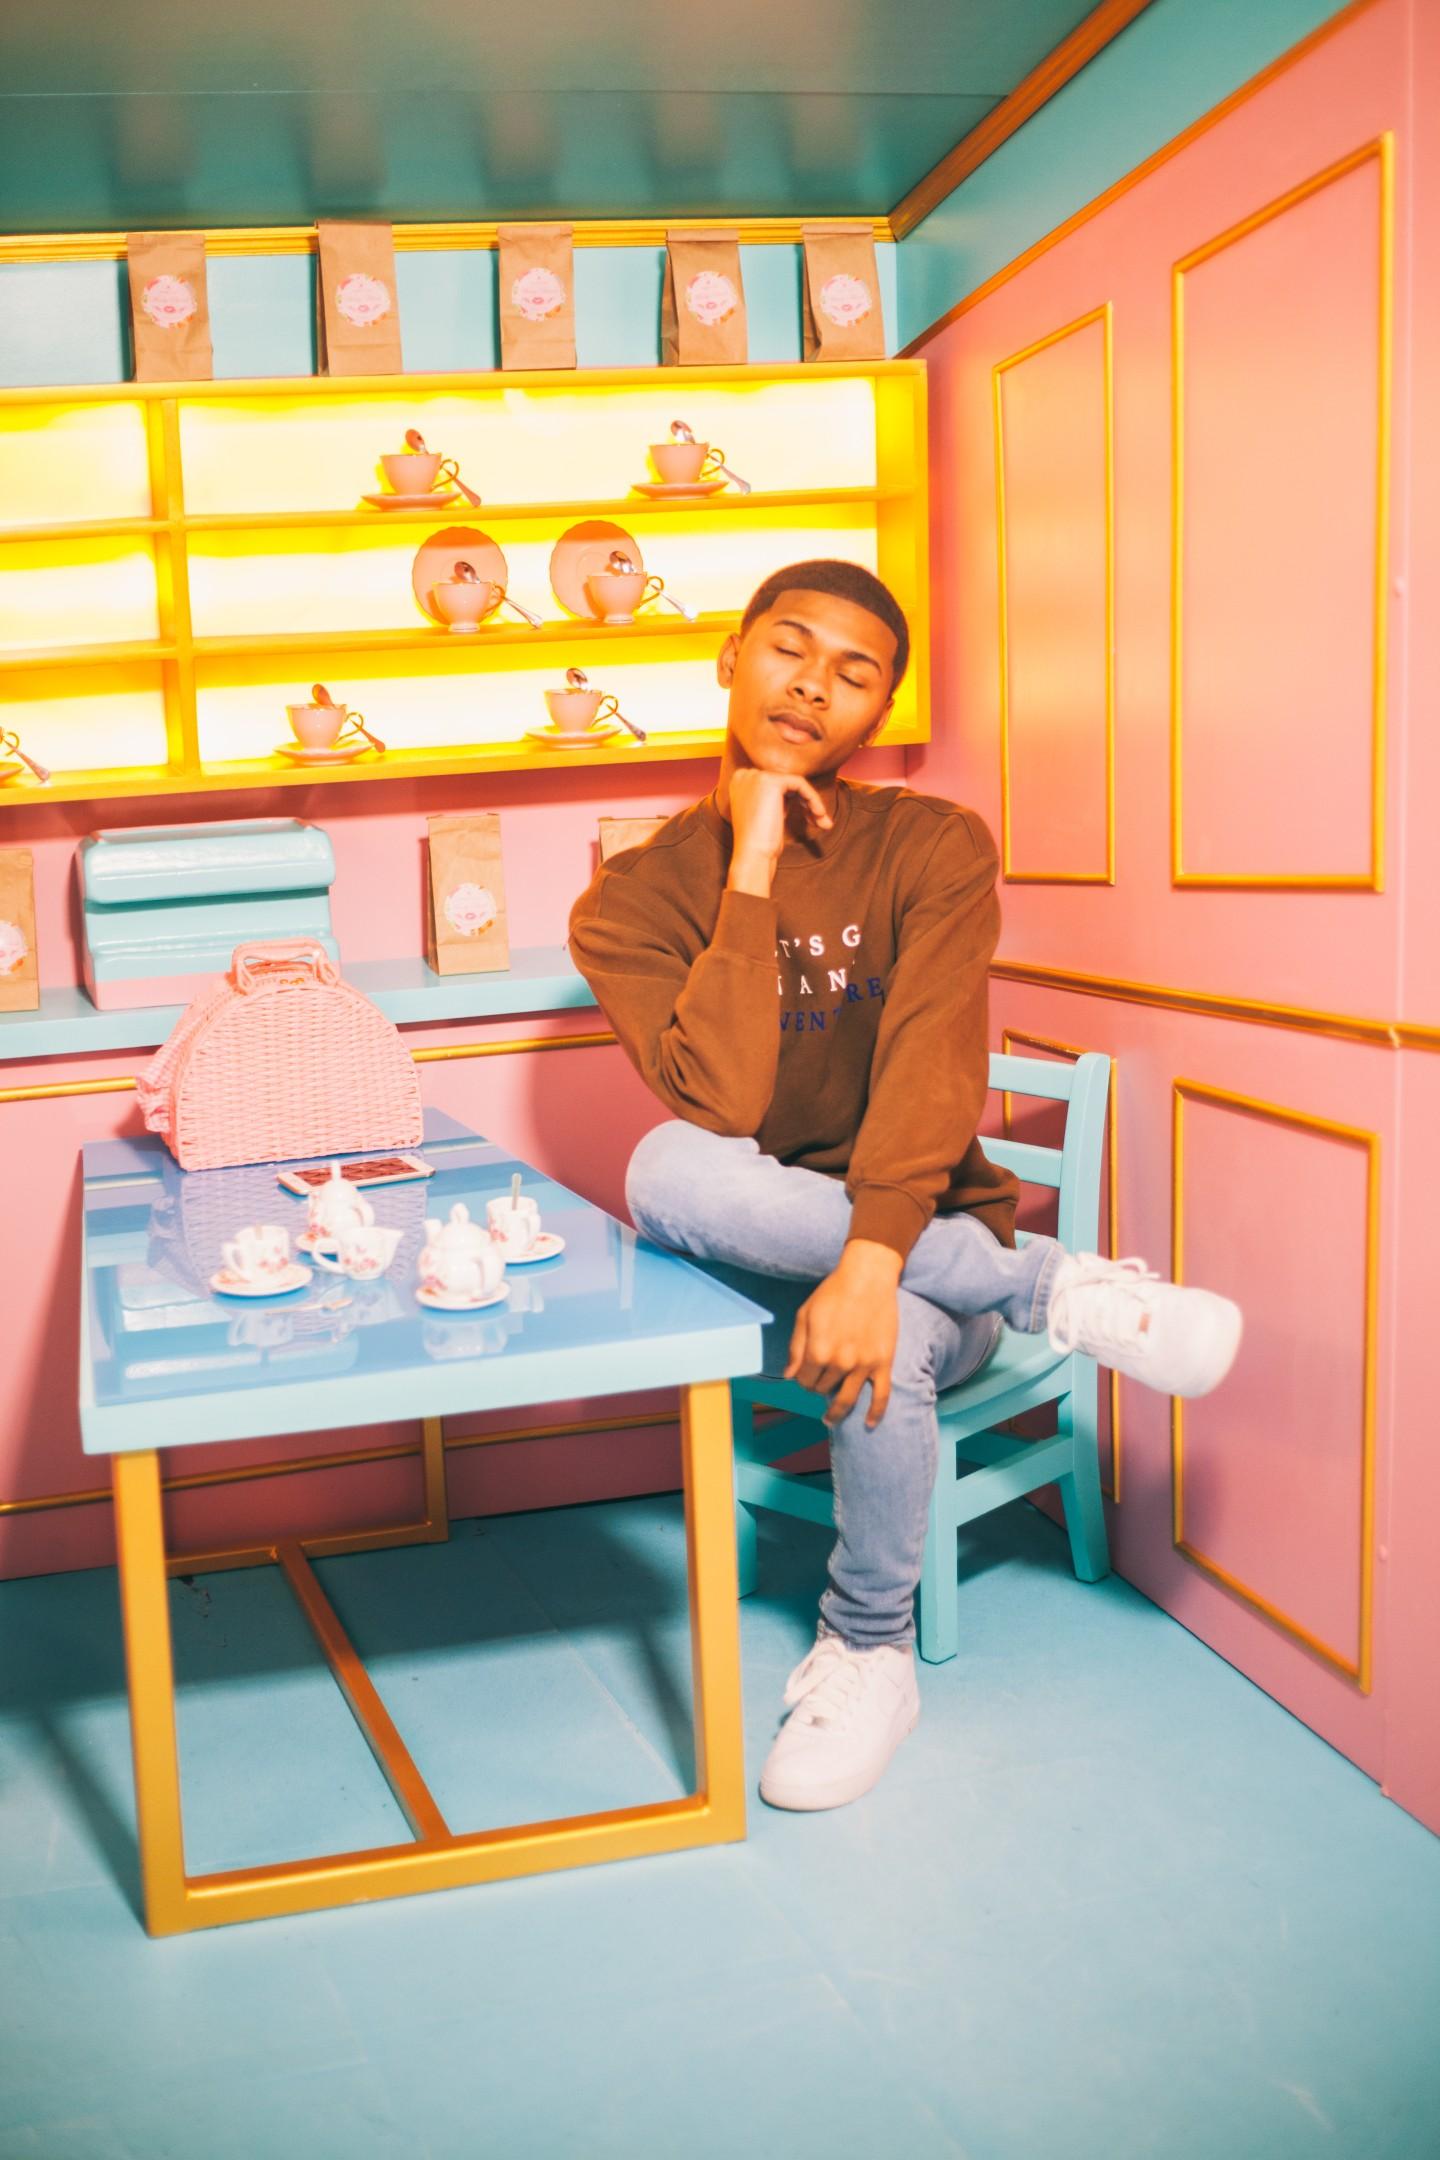 Kidd Kenn is Chicago's next teen sensation